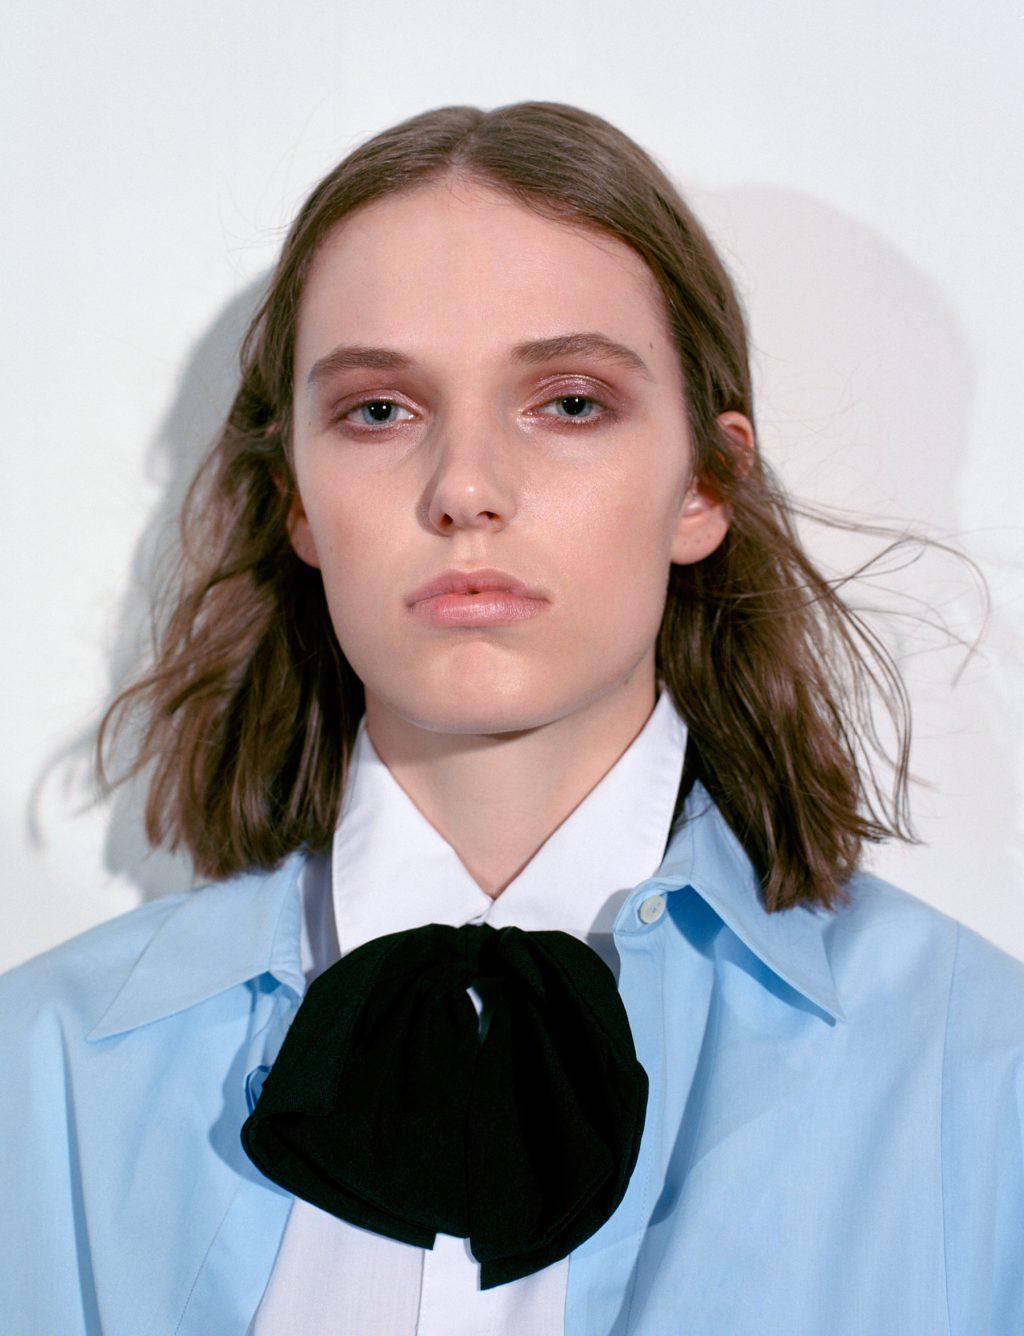 beauty hair and make up work editorial mua fashion